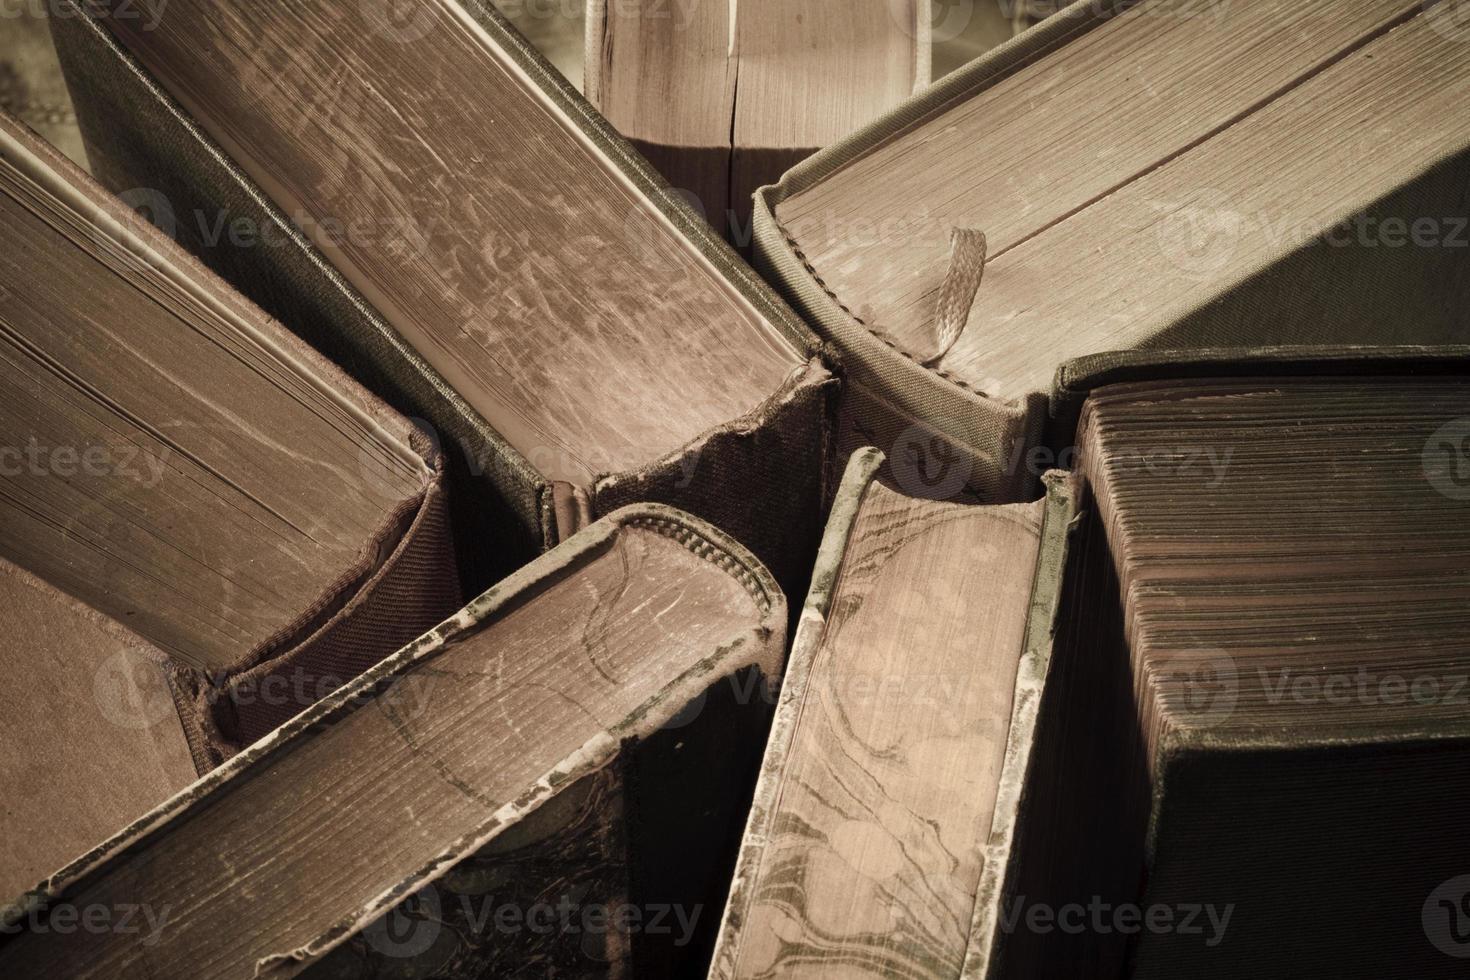 Vintage Bücher hautnah foto